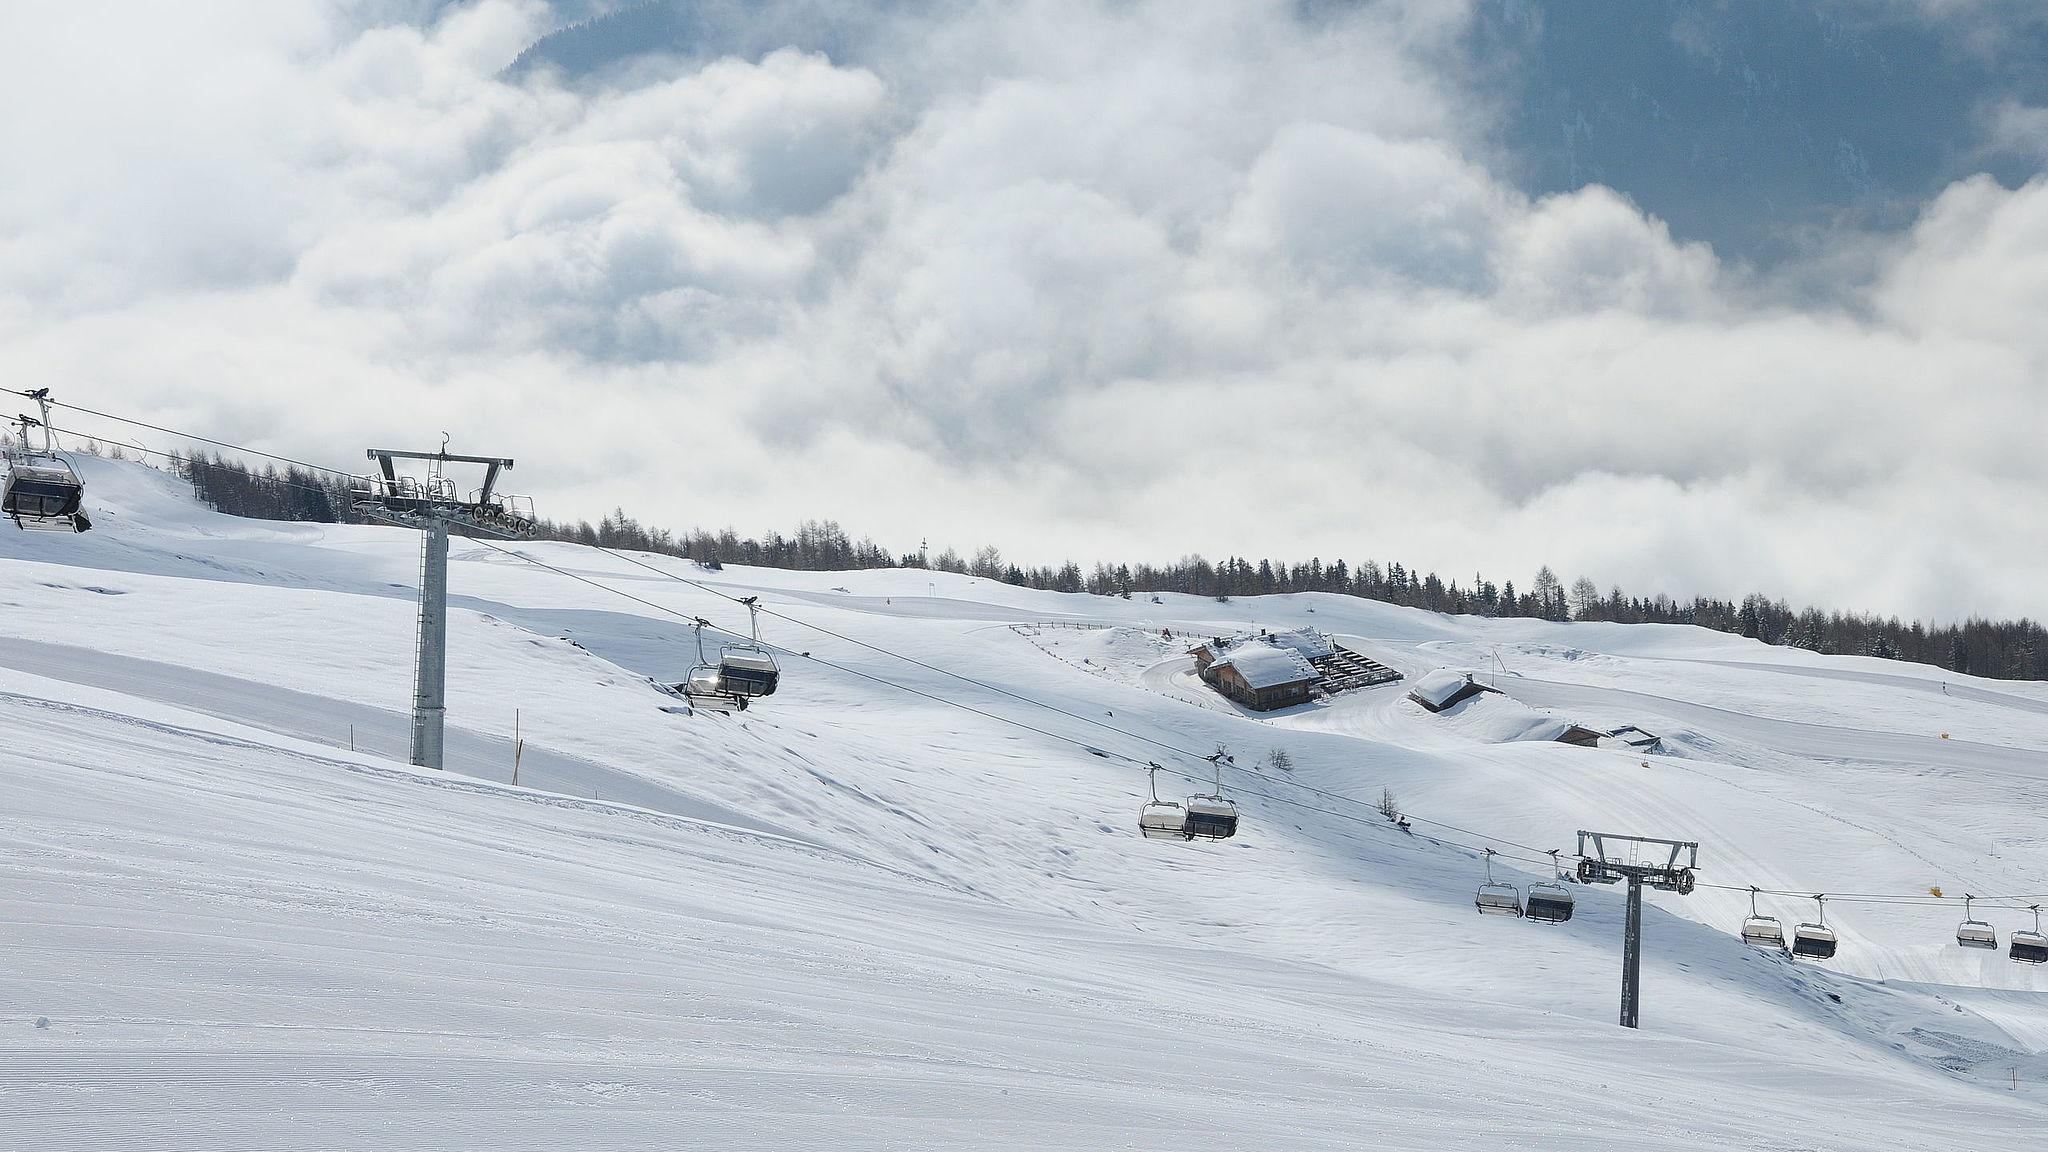 Winterurlaub in Vöran, Eggerhof